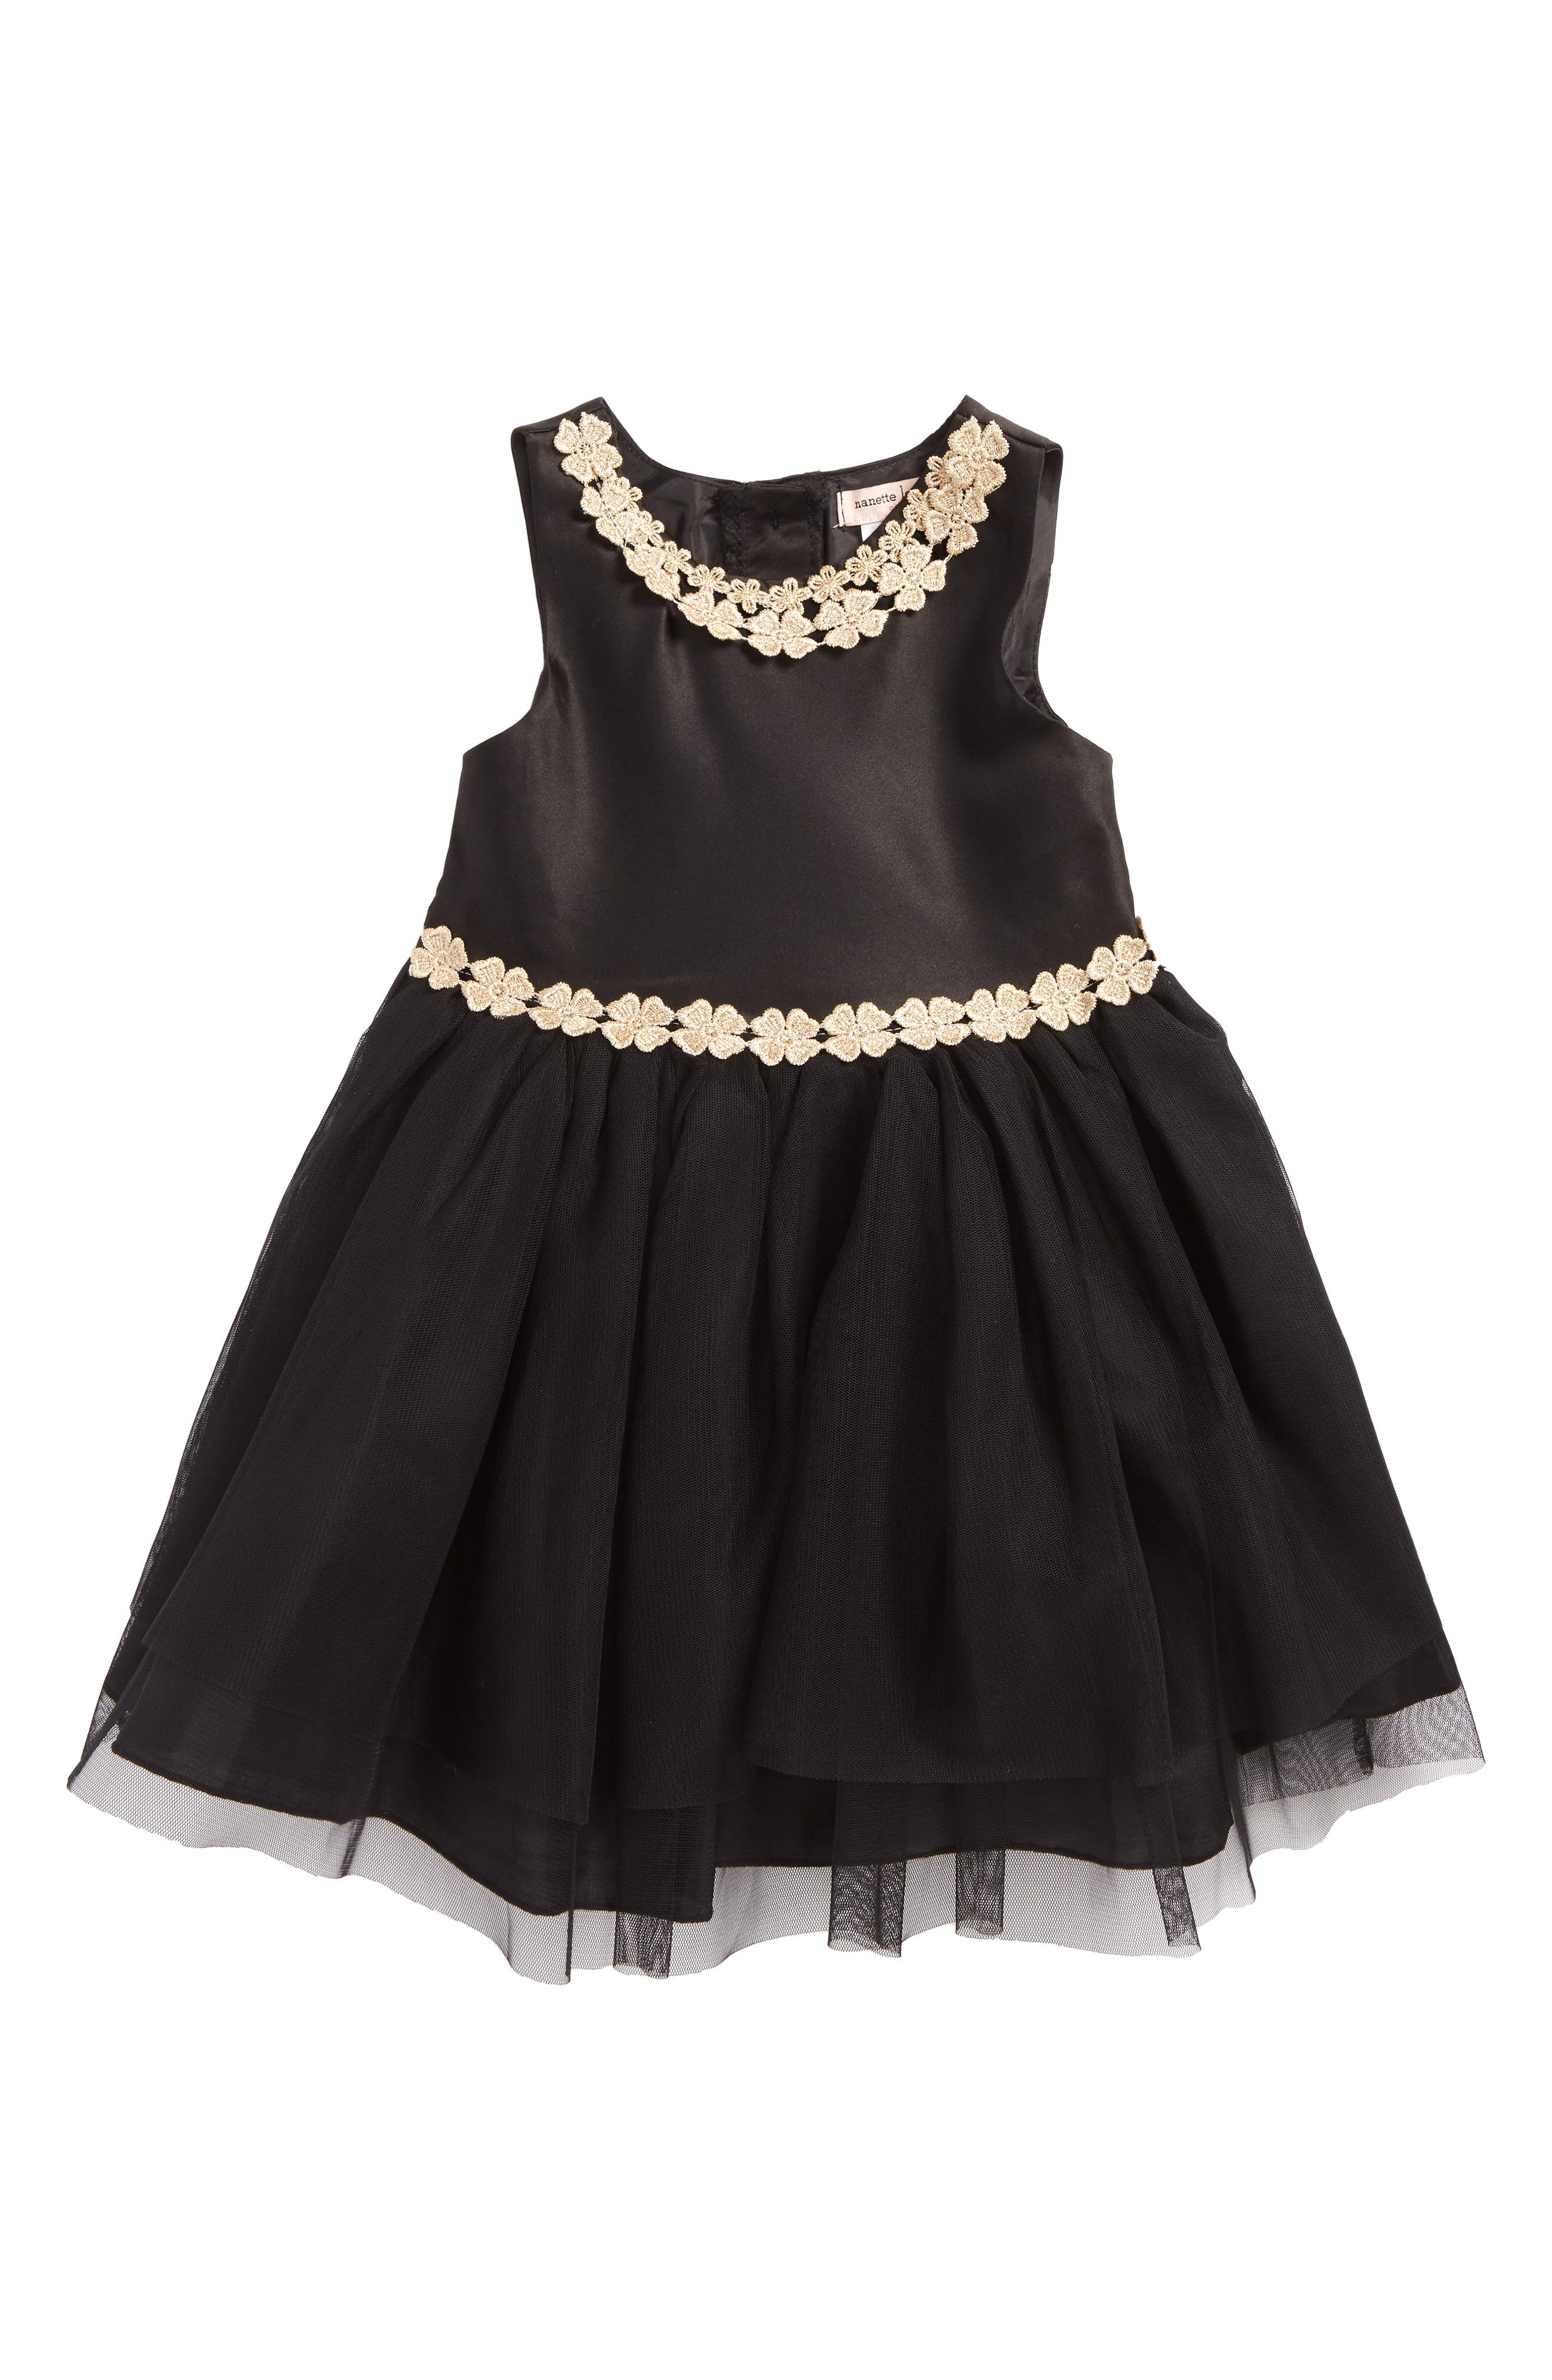 Satin & Tulle Dress,                             Main thumbnail 1, color,                             001